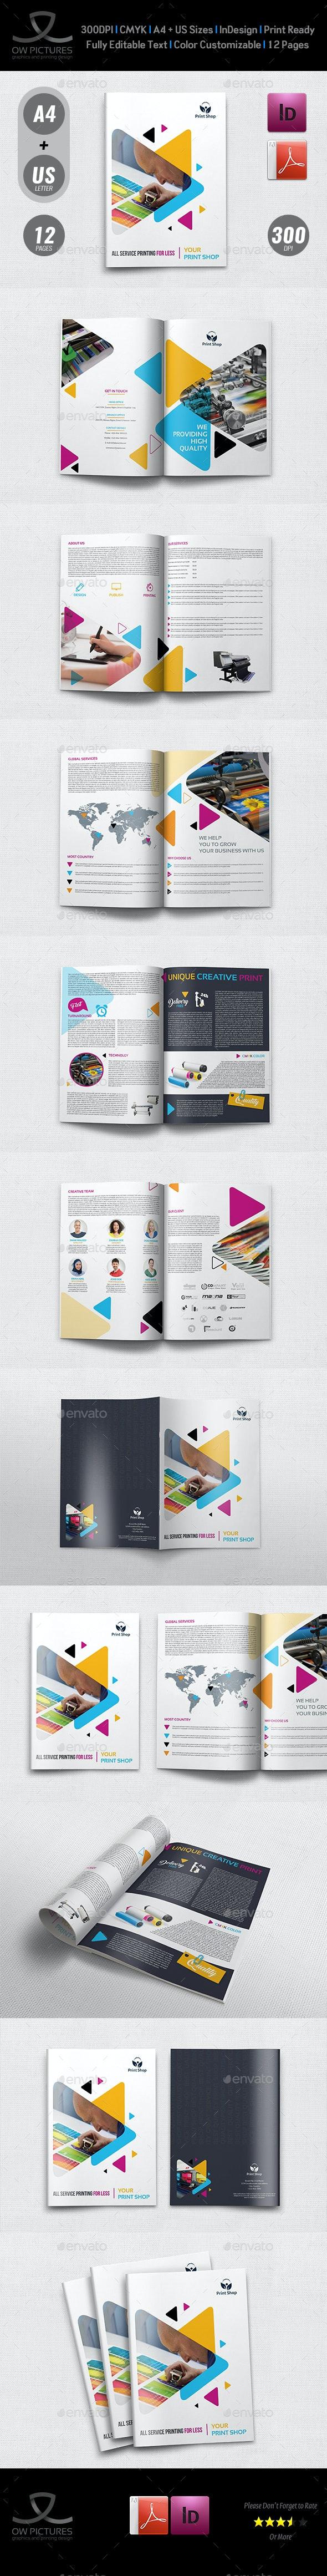 Print Shop Brochure Template - 12 Pages - Brochures Print Templates